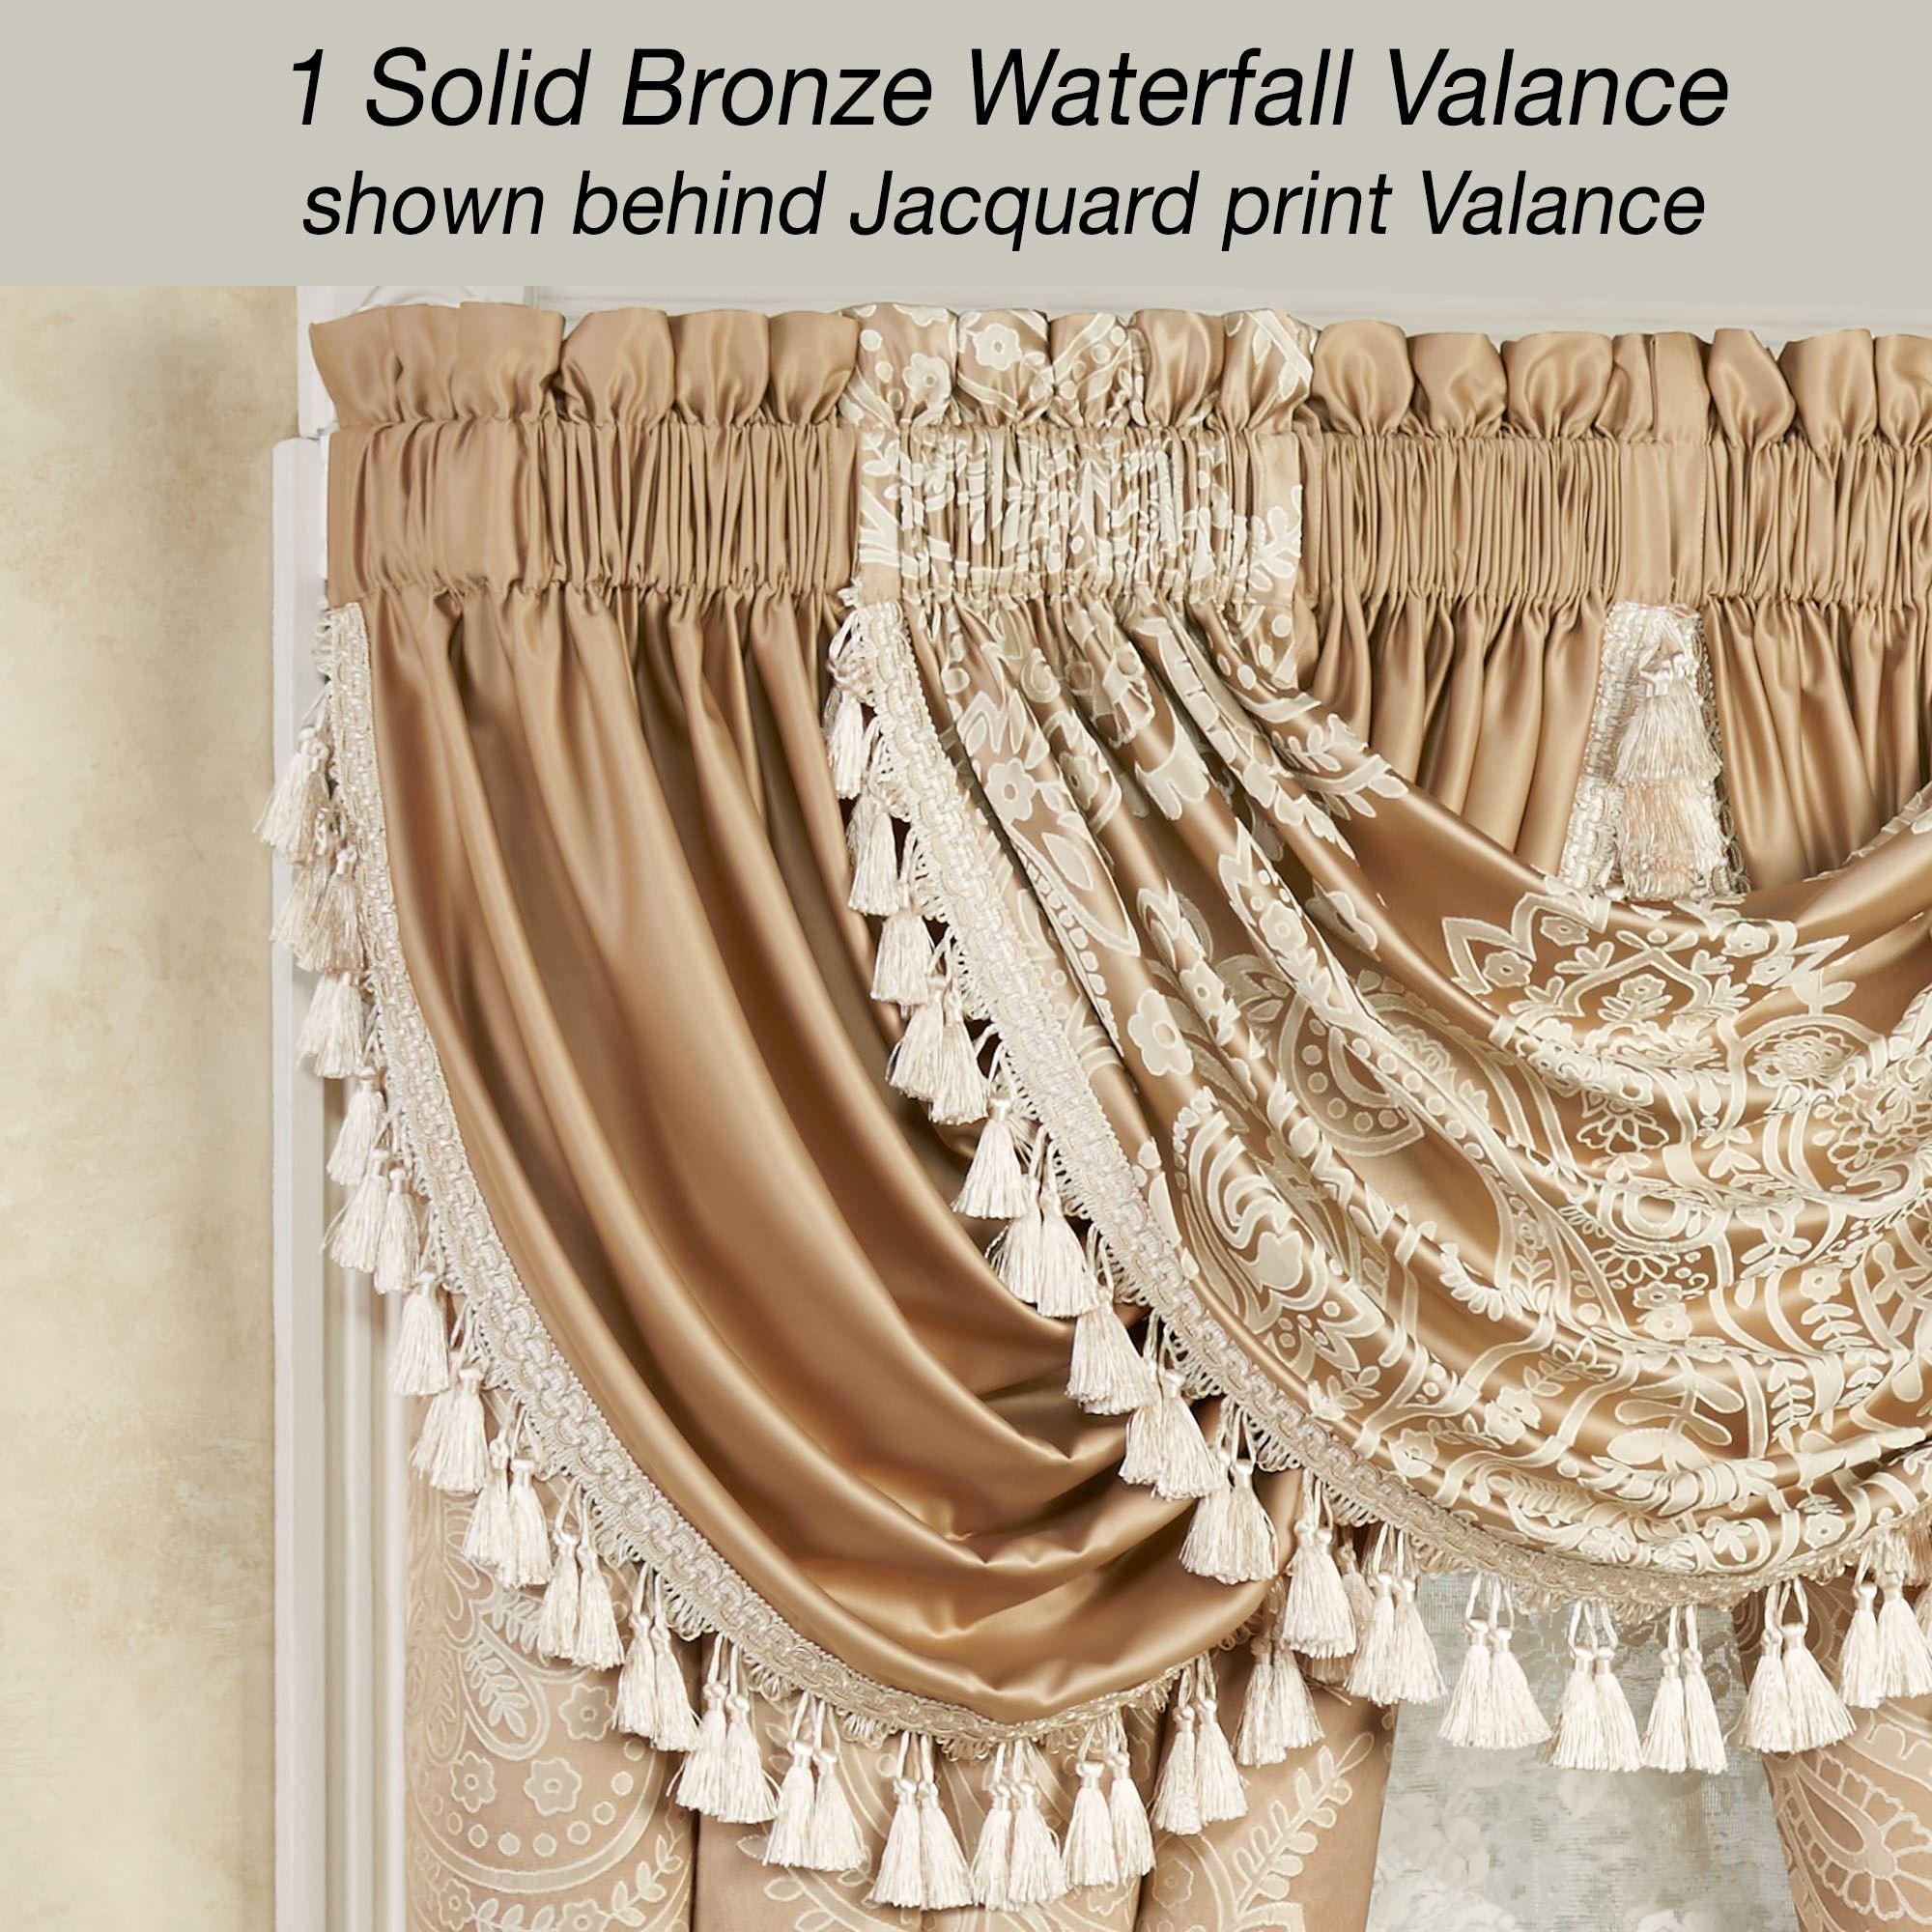 Monarch Golden Bronze Comforter Bedding Bed Comforters Gold Pillows Curtain Decor